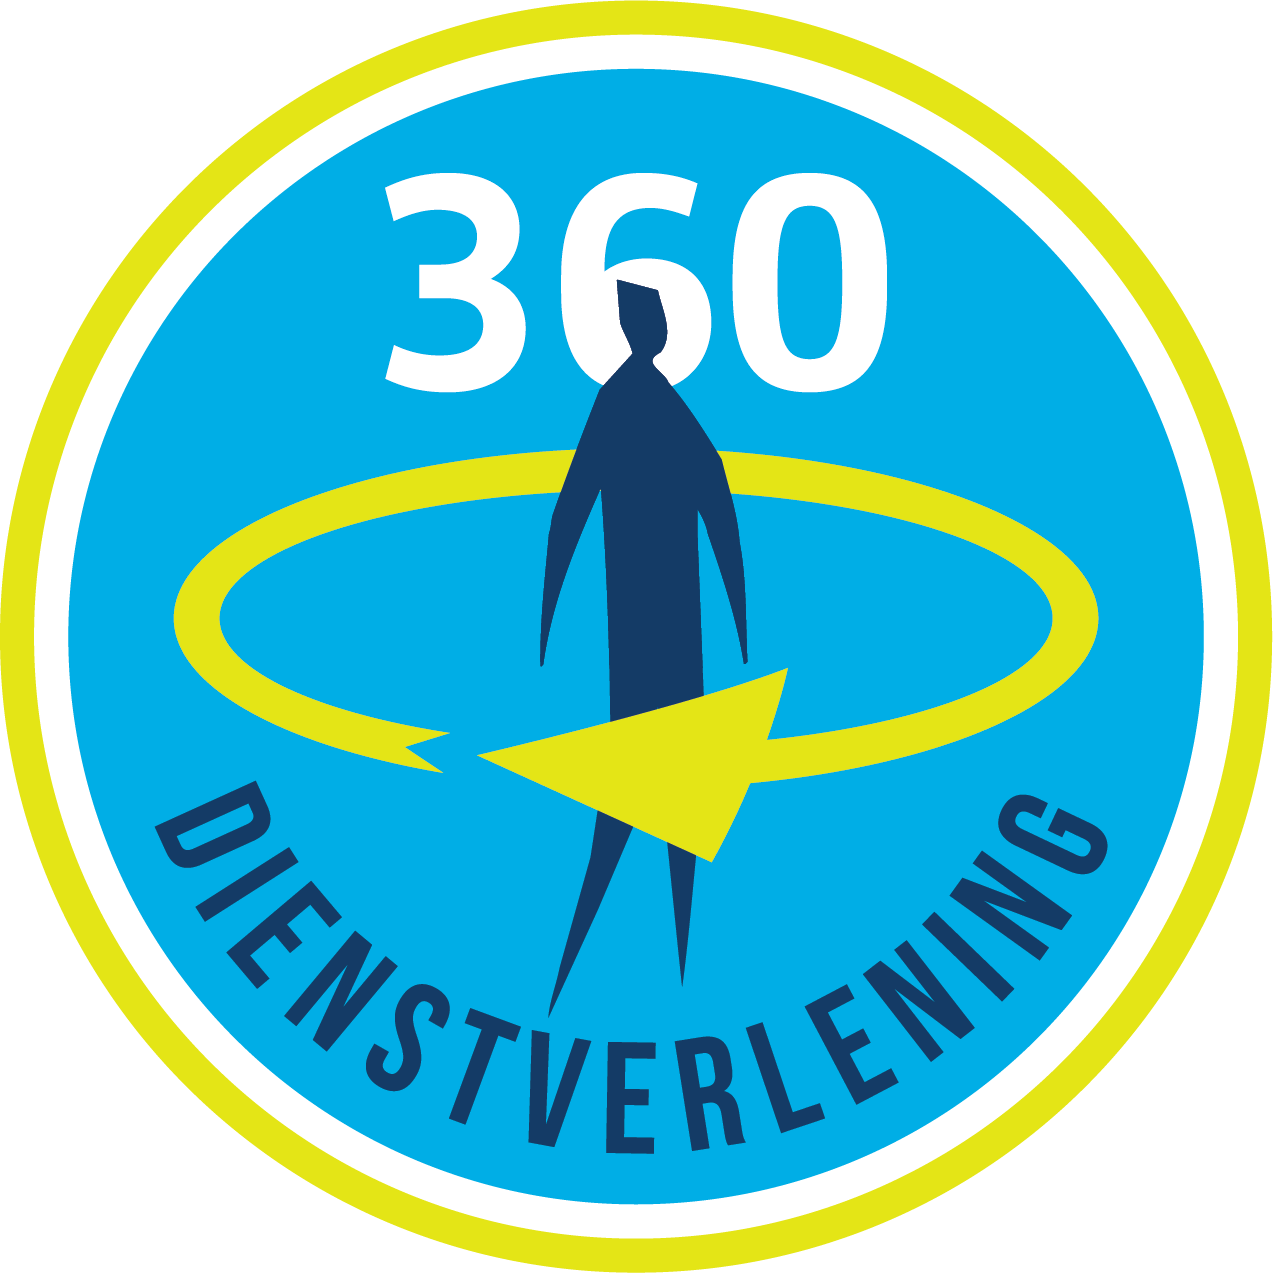 aclvb-universele_diensten-logo-cmyk_ok-2_3.png